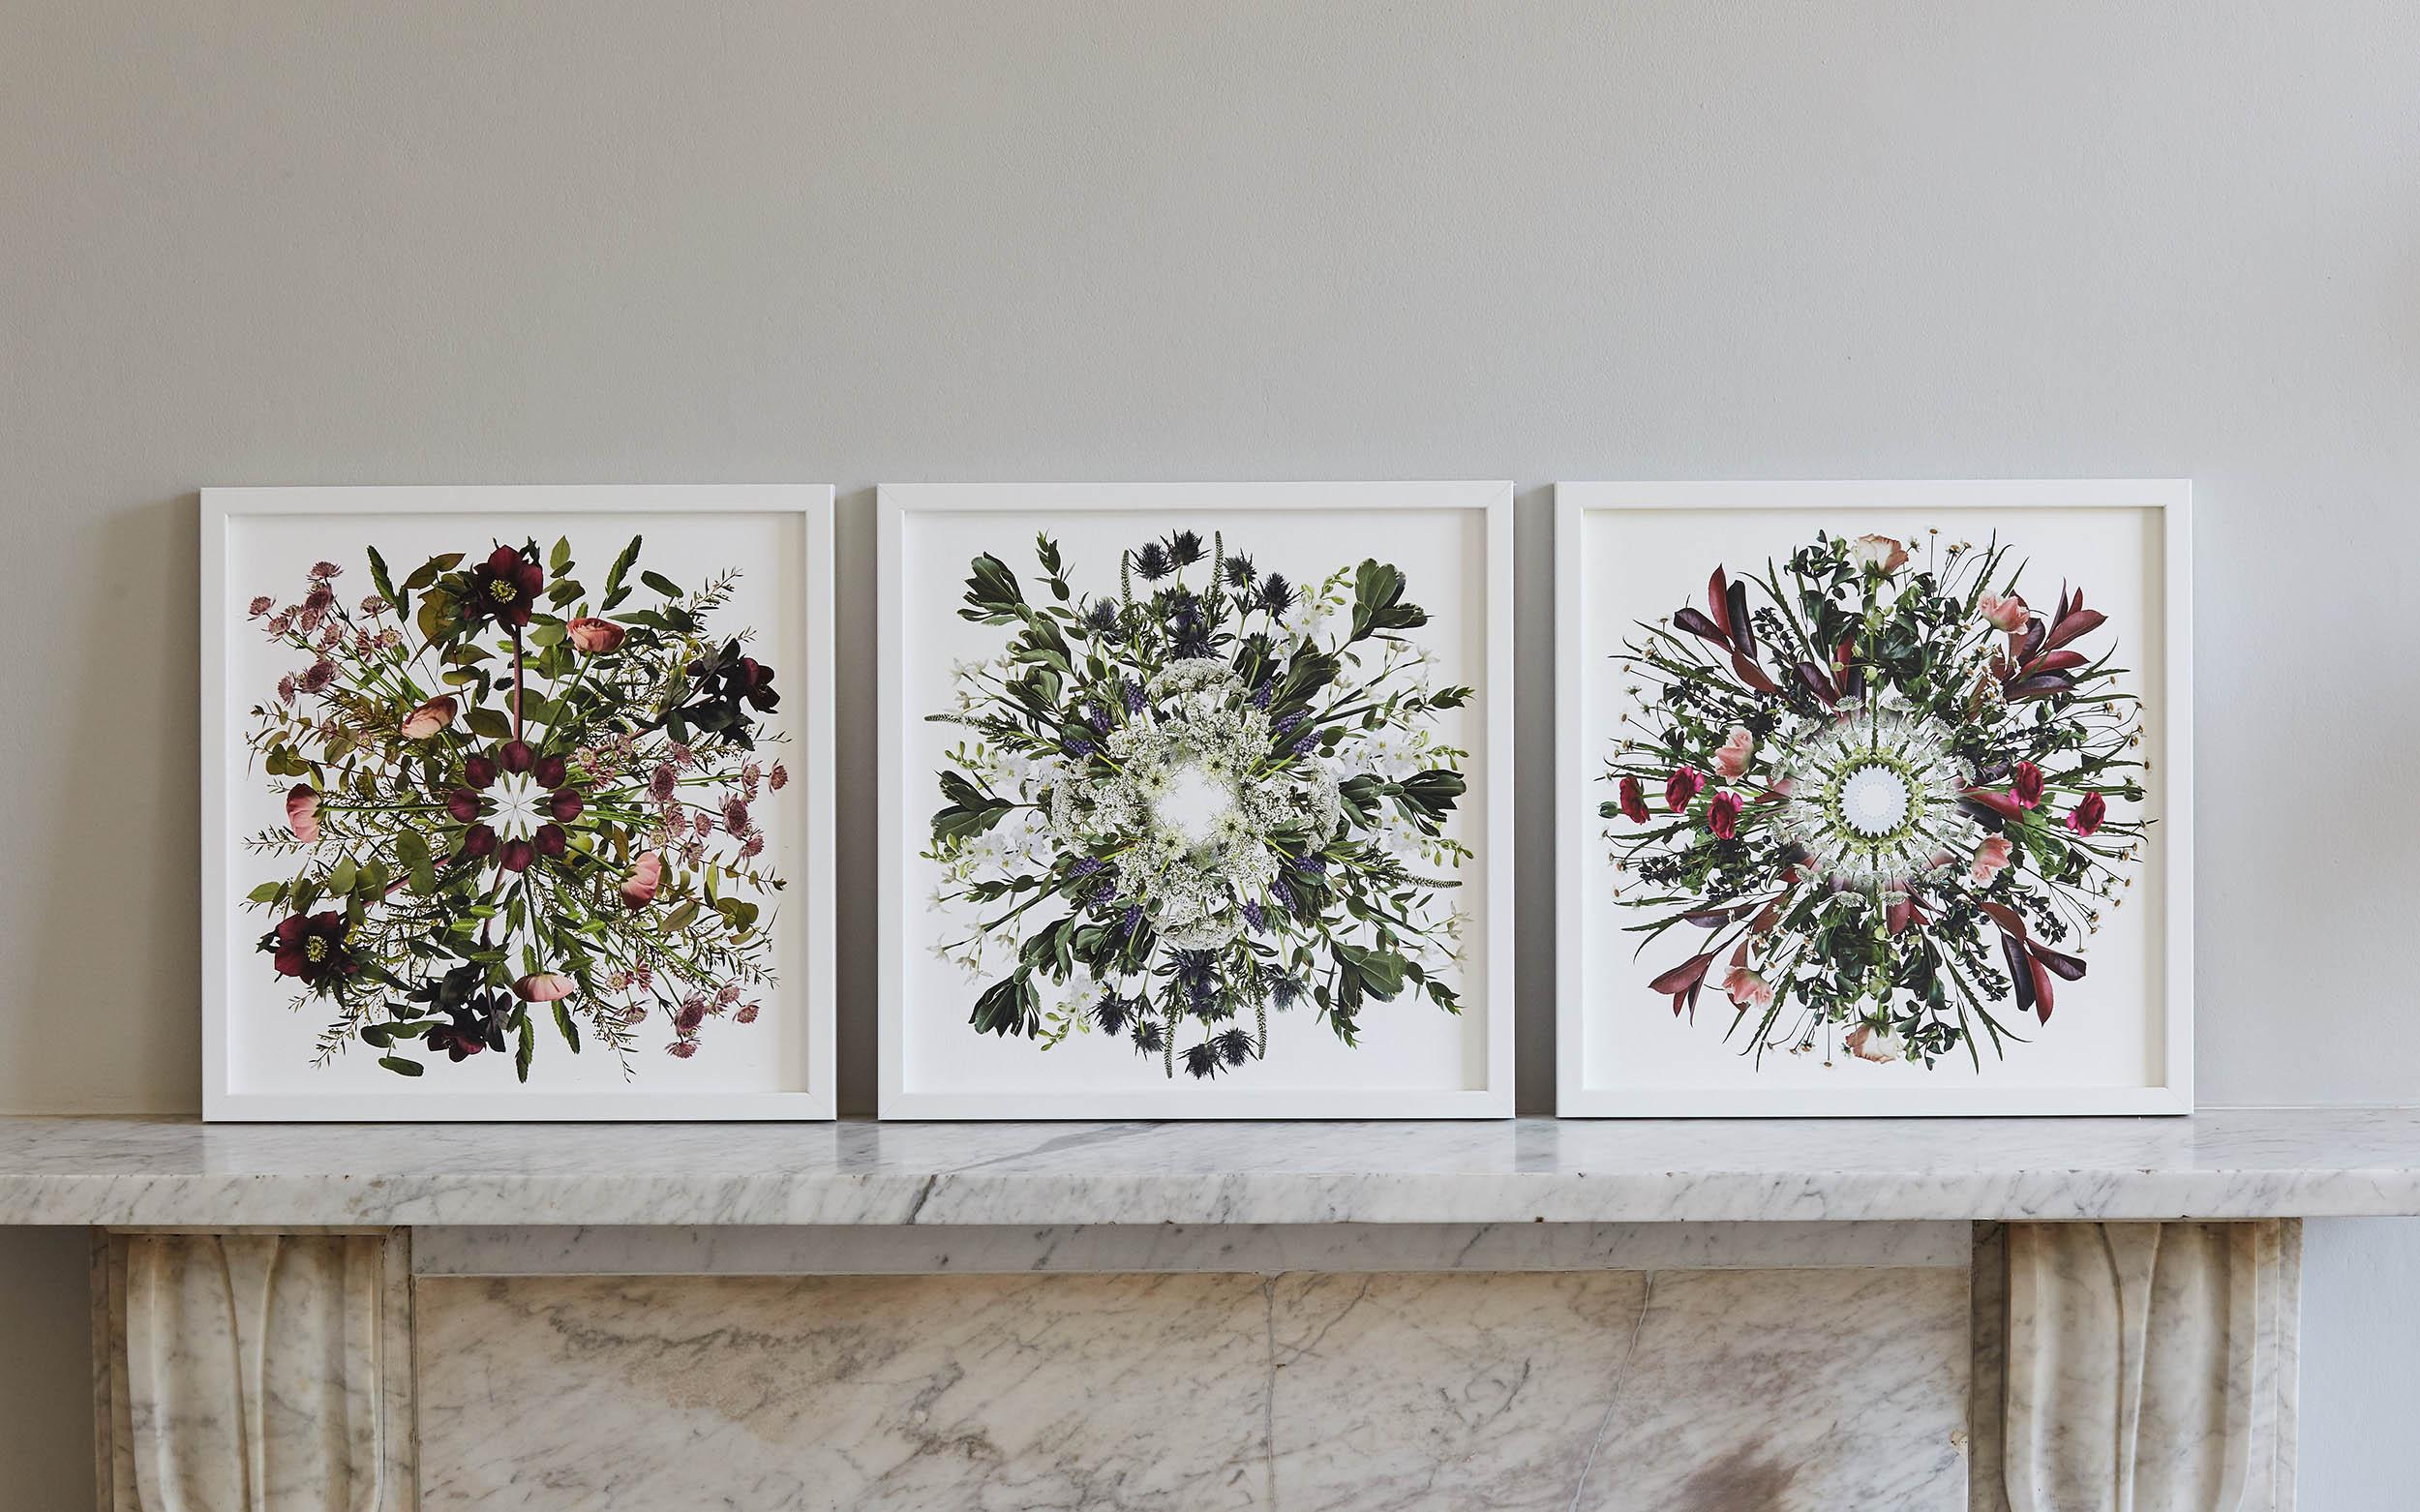 bespoke-artwork-flowers-foliage-bouquet-preservation-memento.jpg